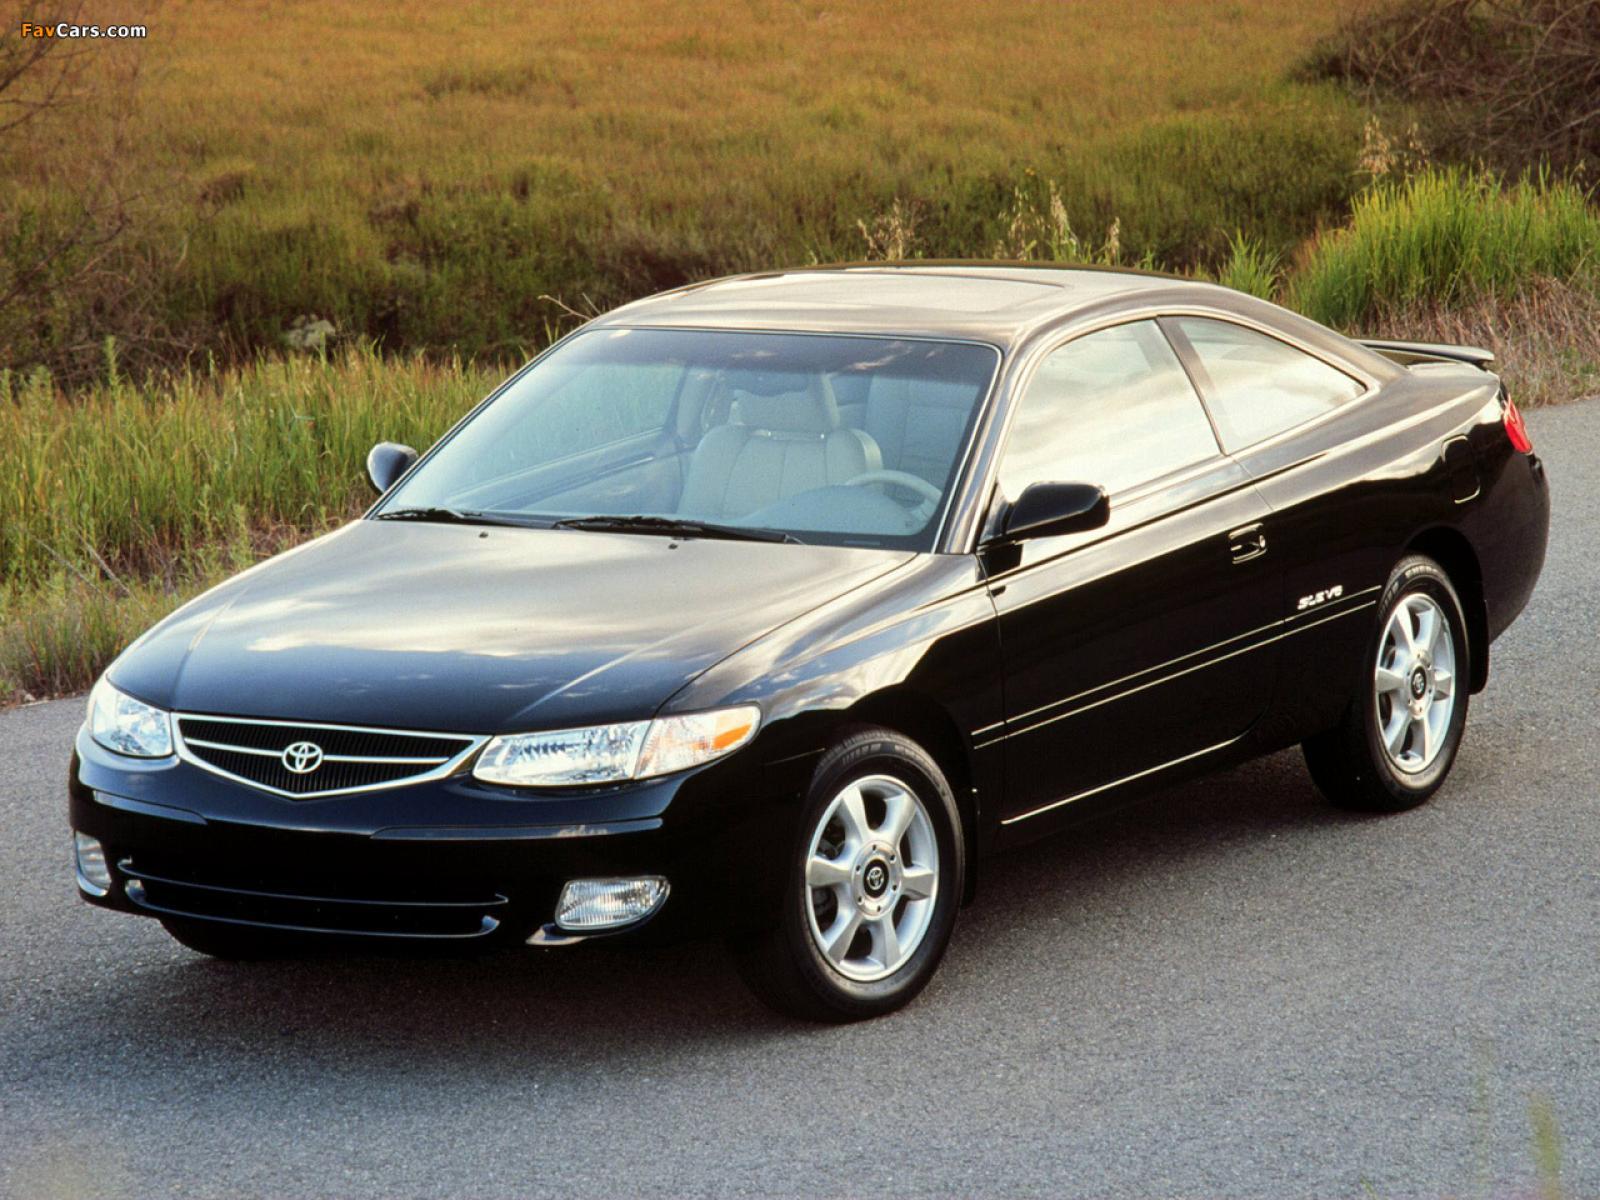 800 1024 1280 1600 origin 2002 Toyota Camry Solara ...